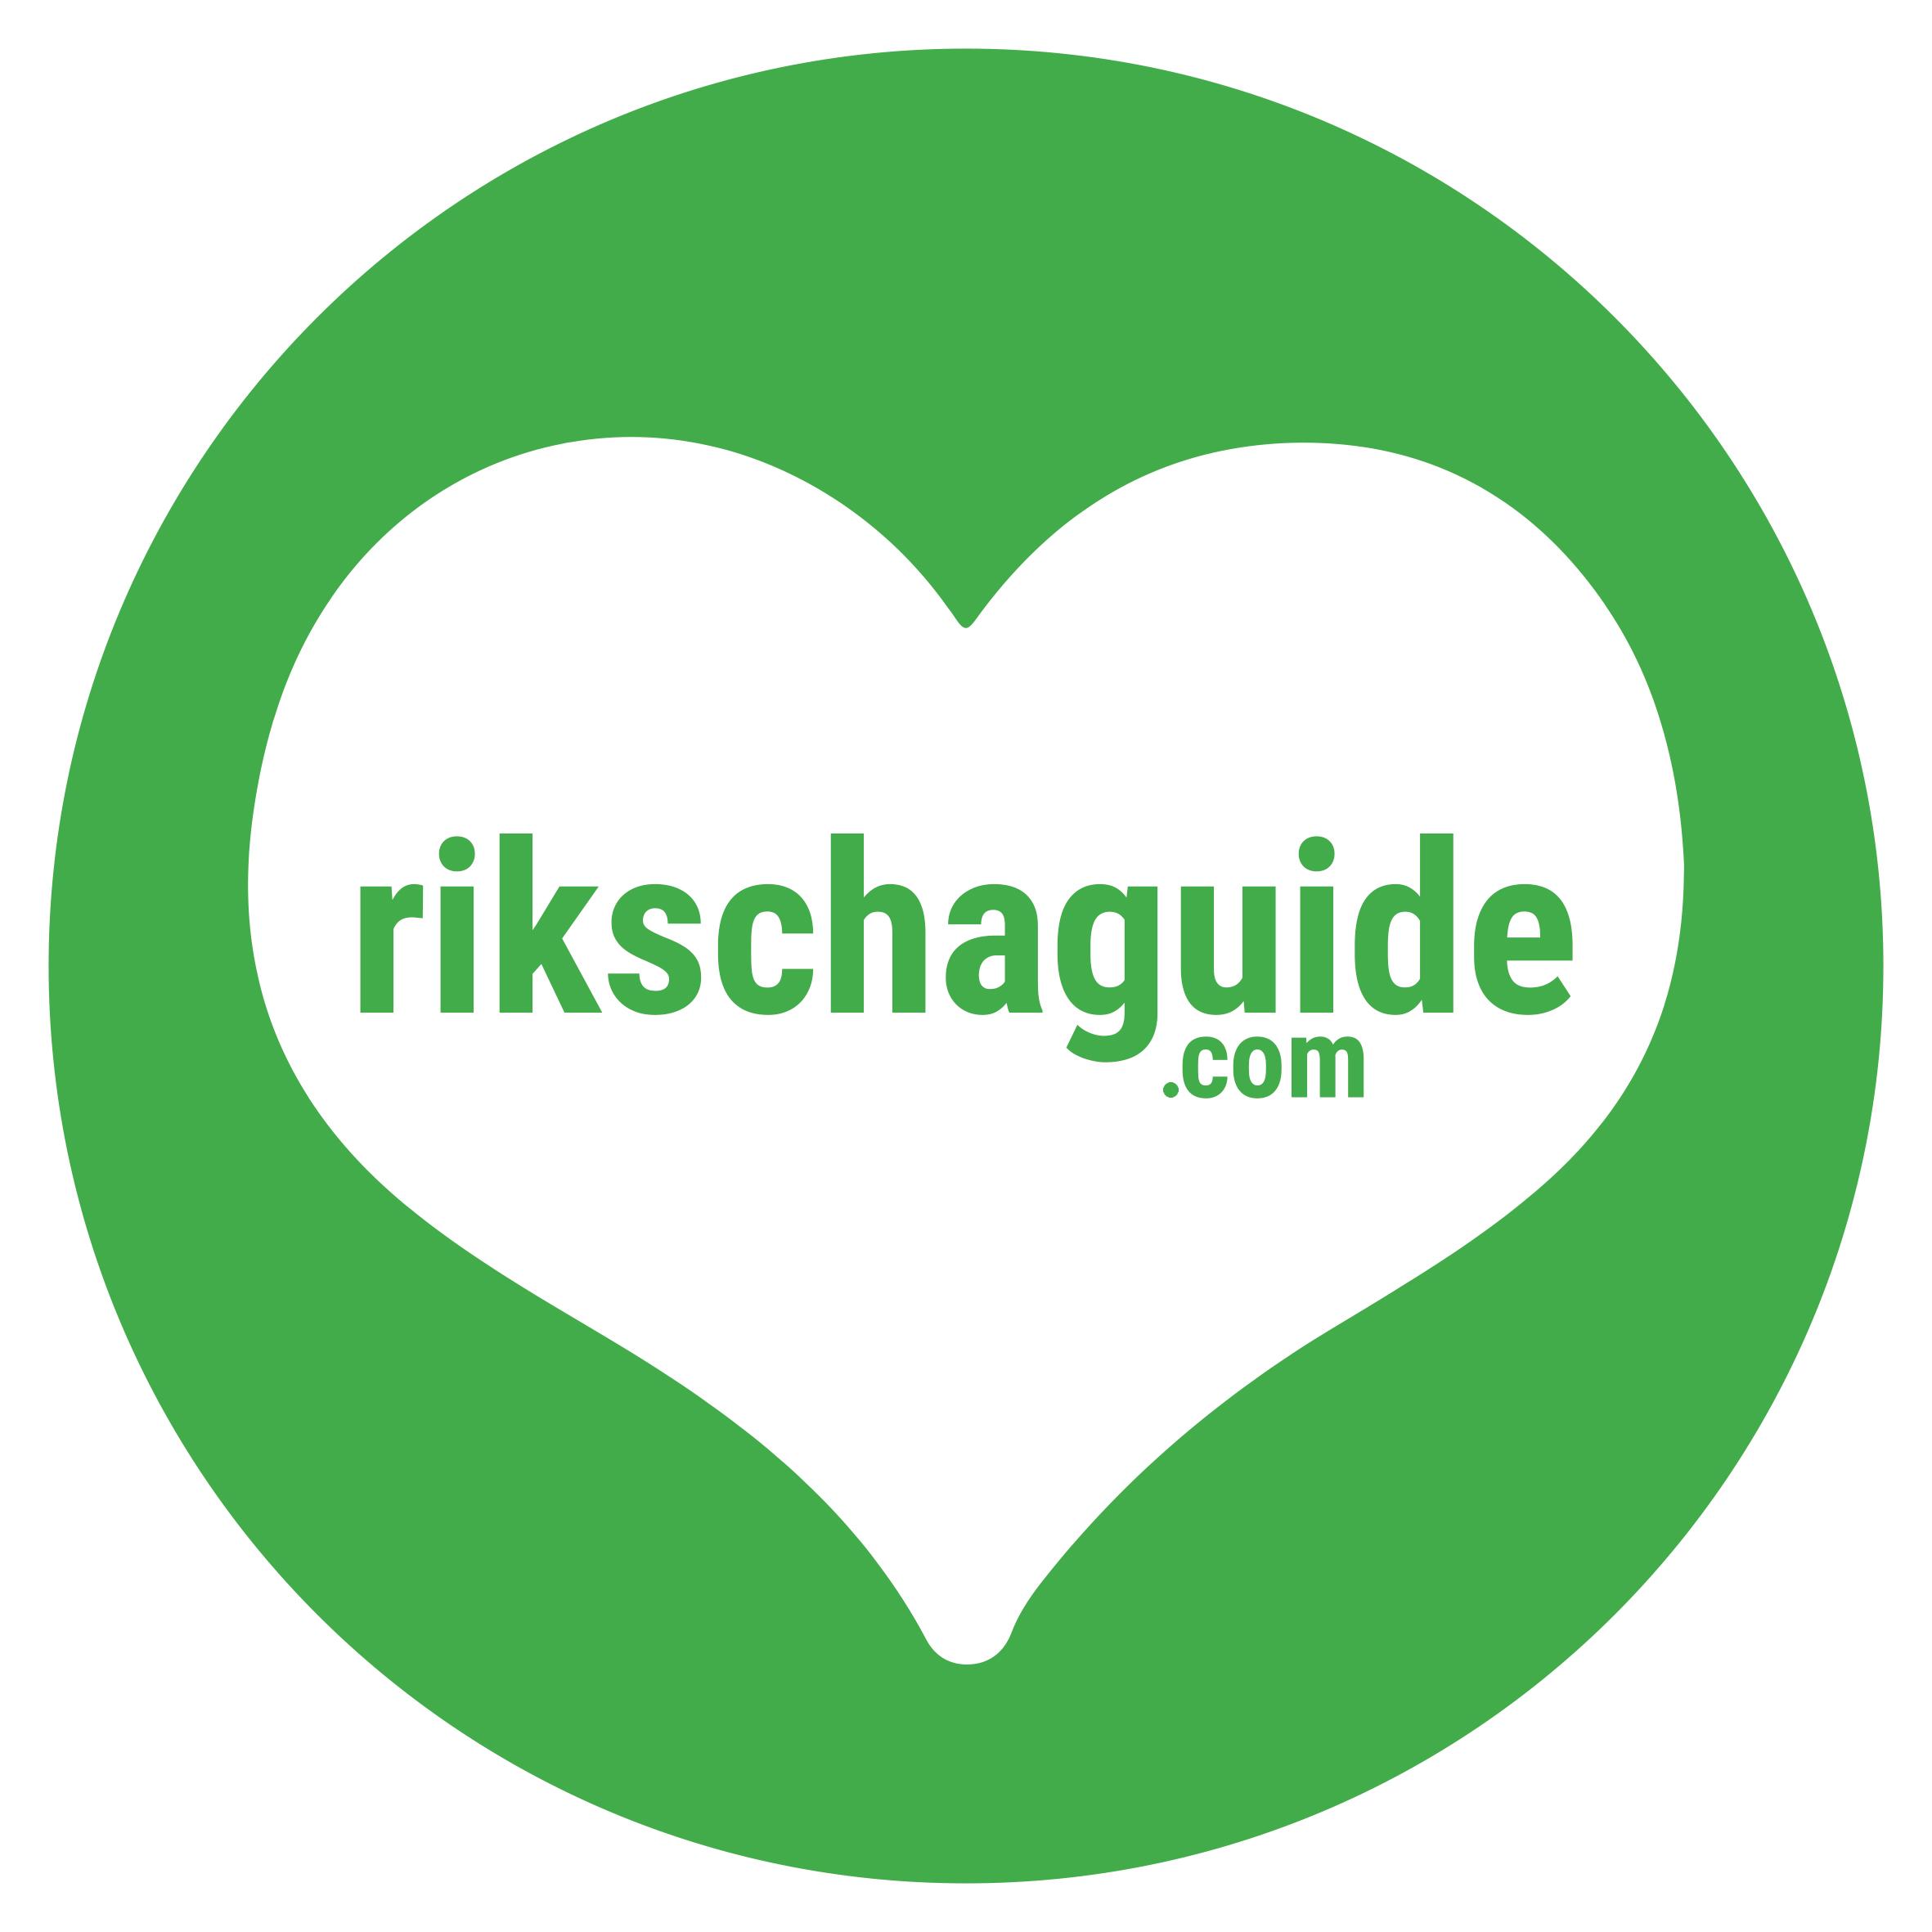 Pedicabguide.com | Your Pedicab Experience in Munich